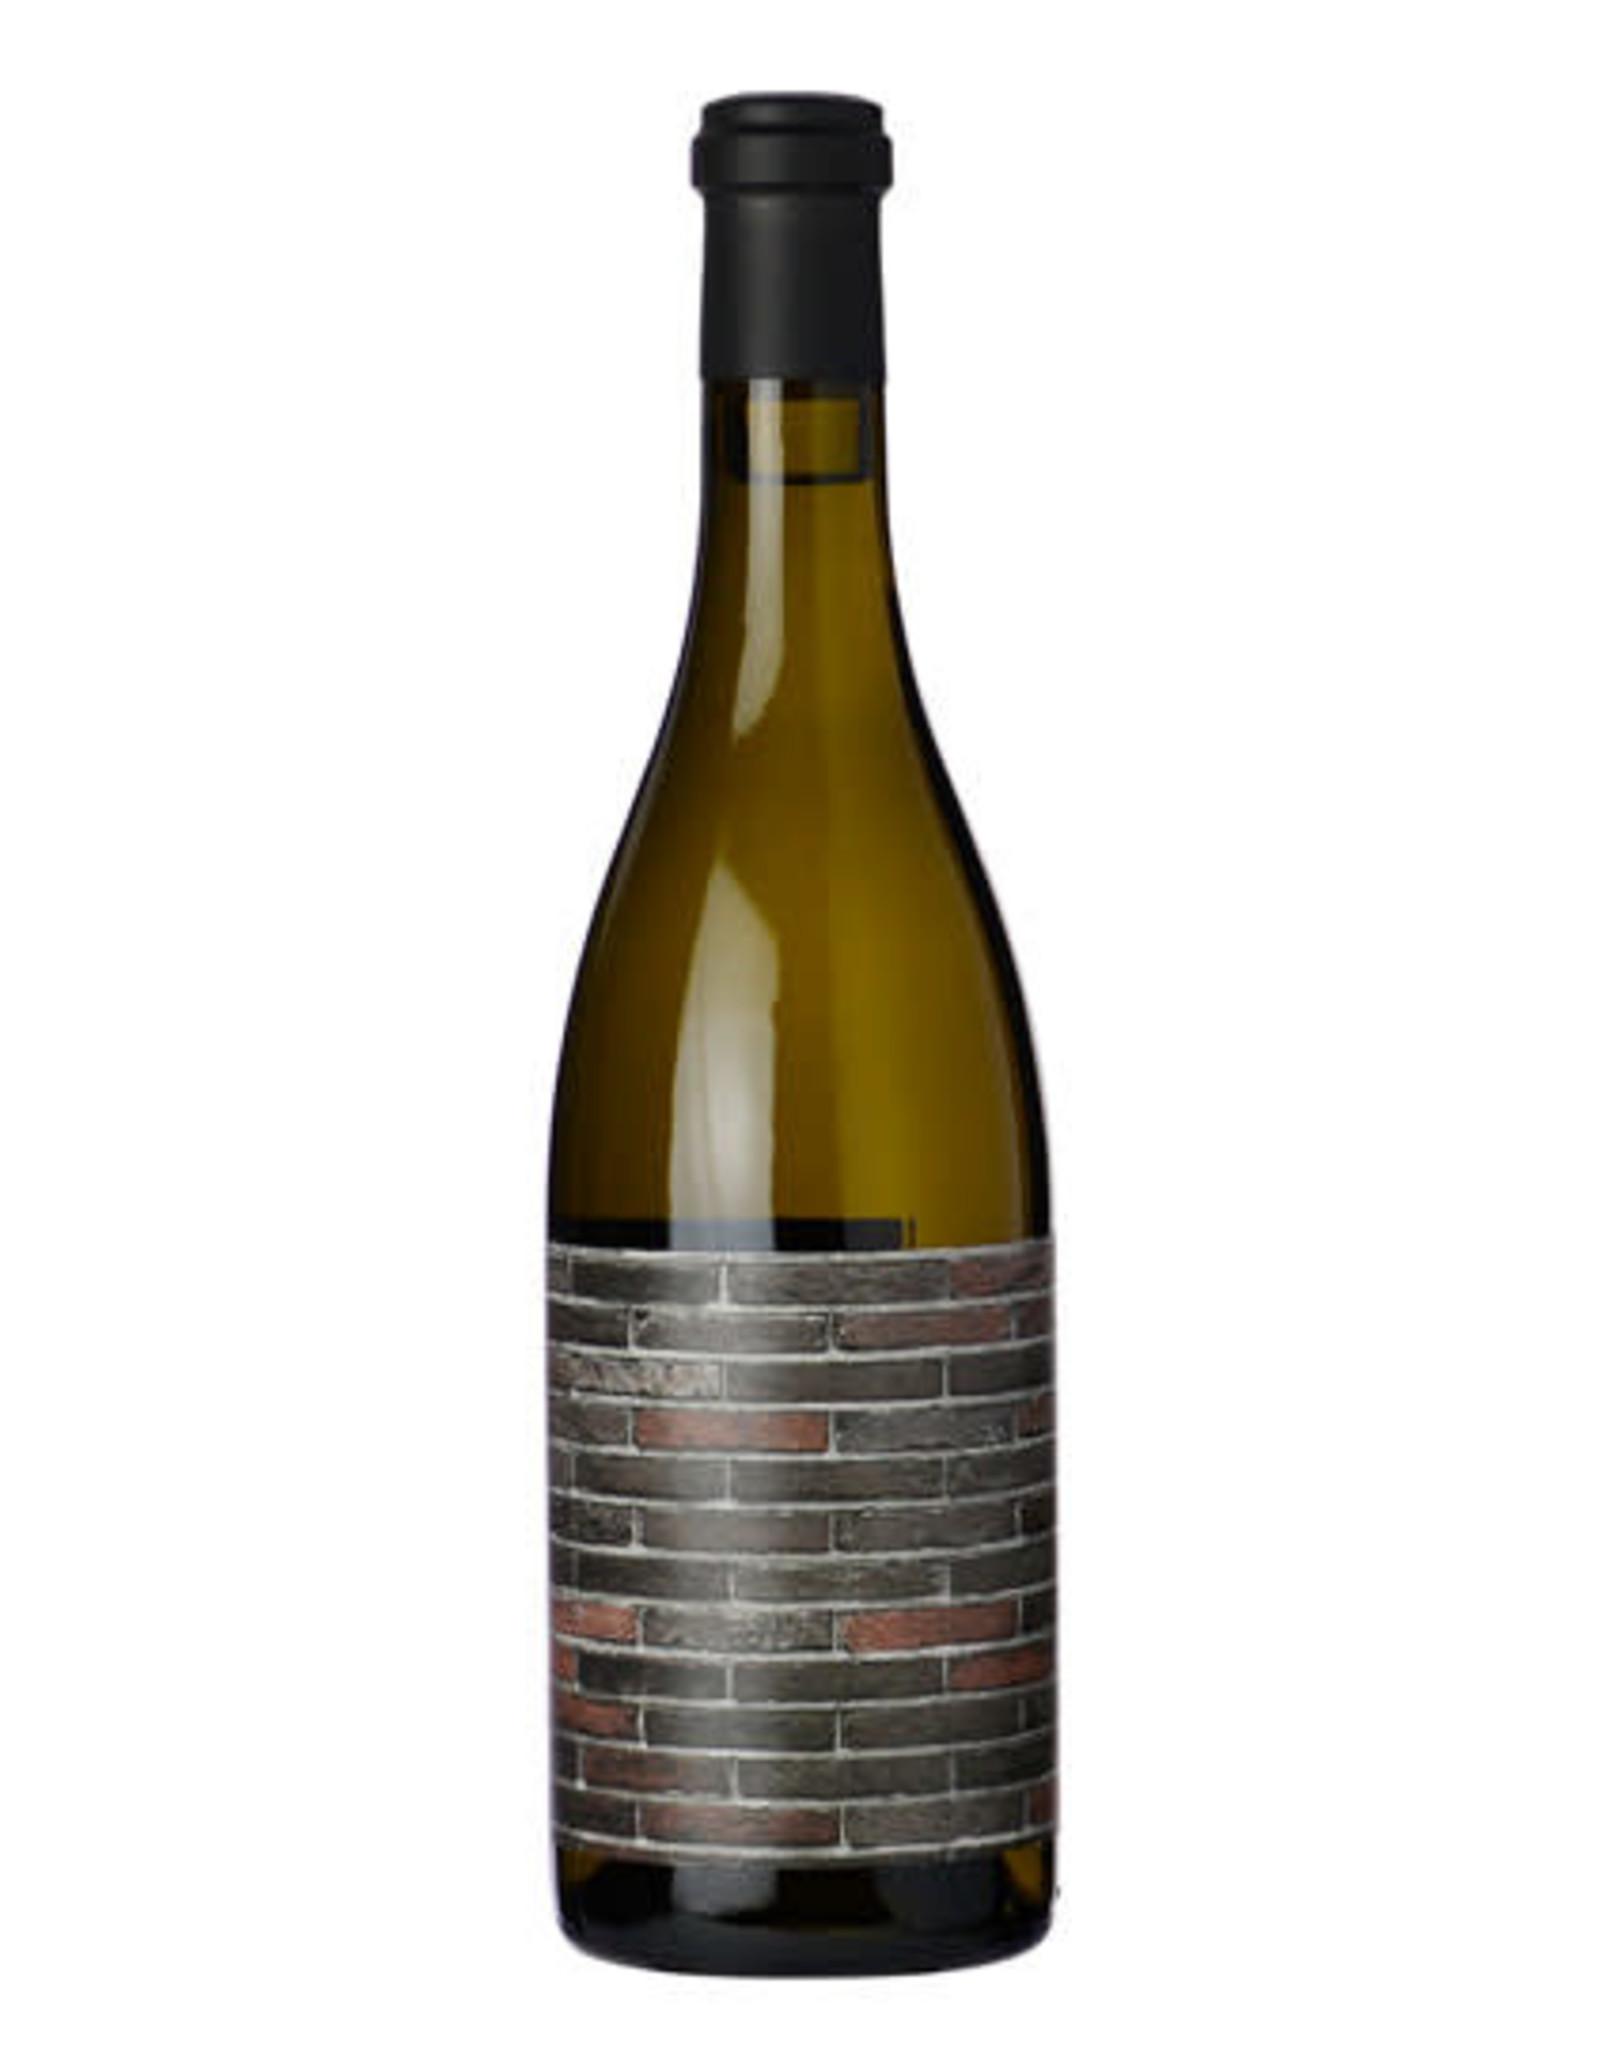 Brick & Mortar, Cougar Rock Chardonnay 2014